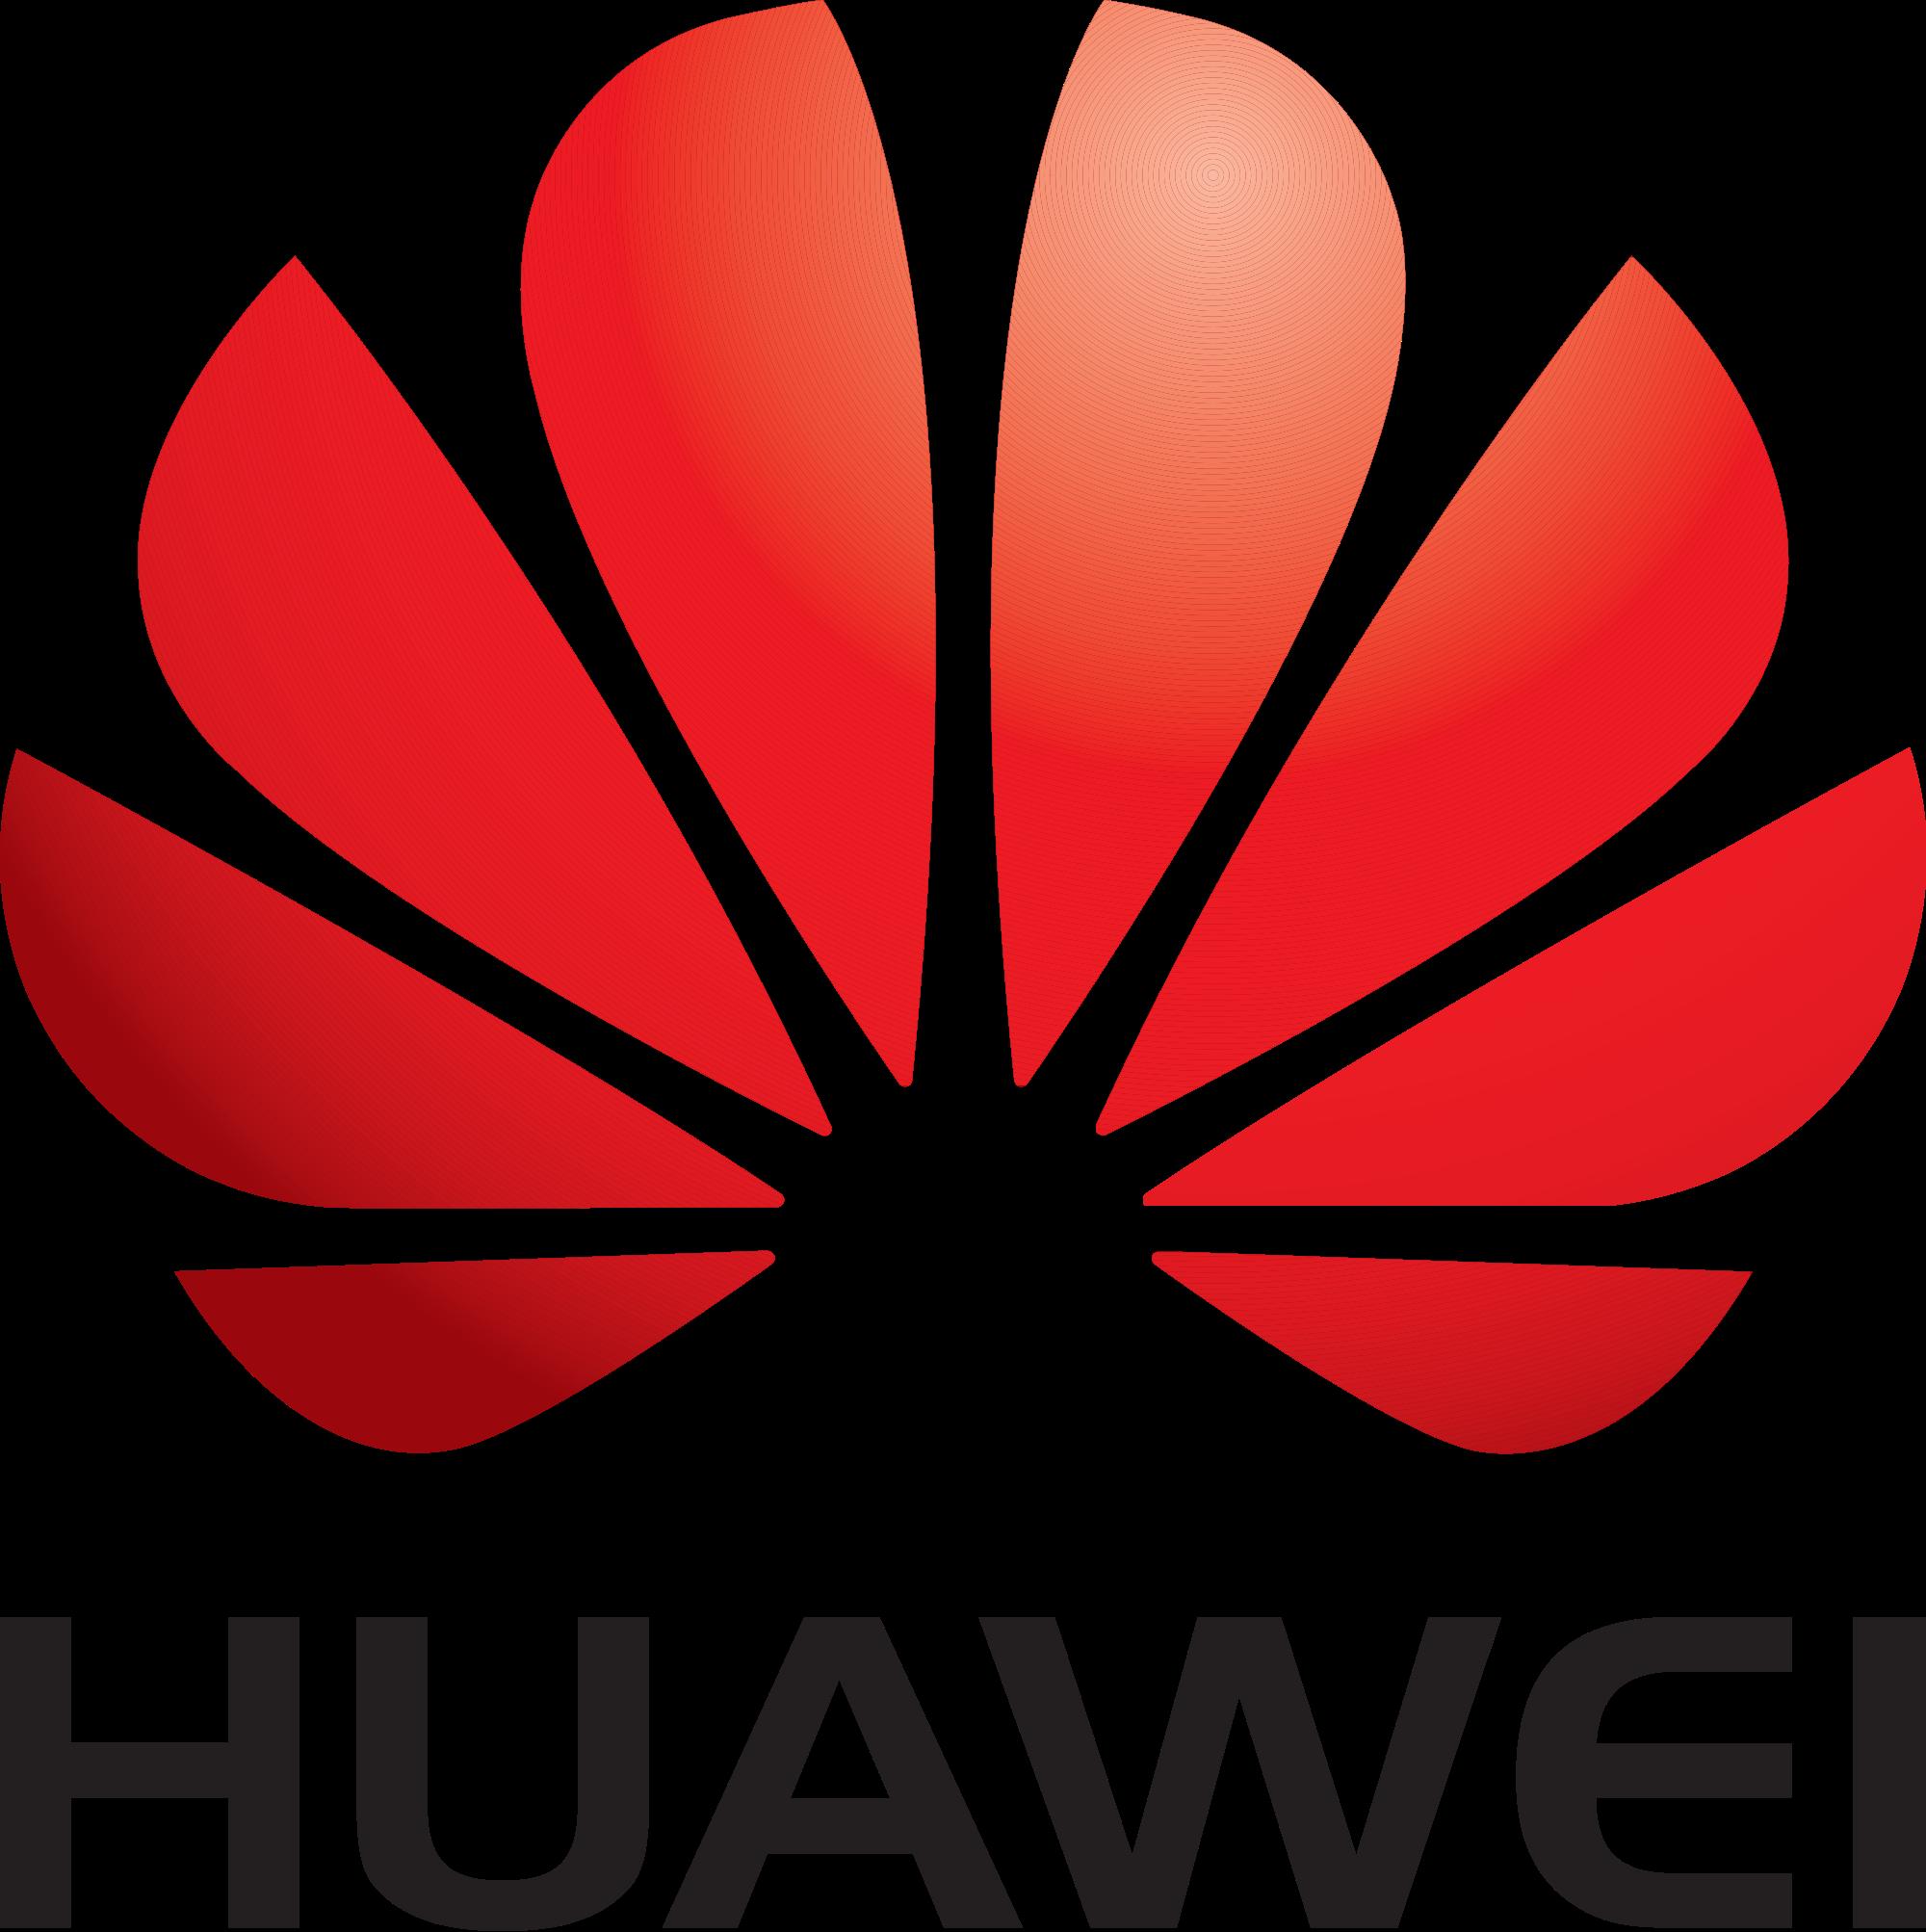 Comprar Huawei Online